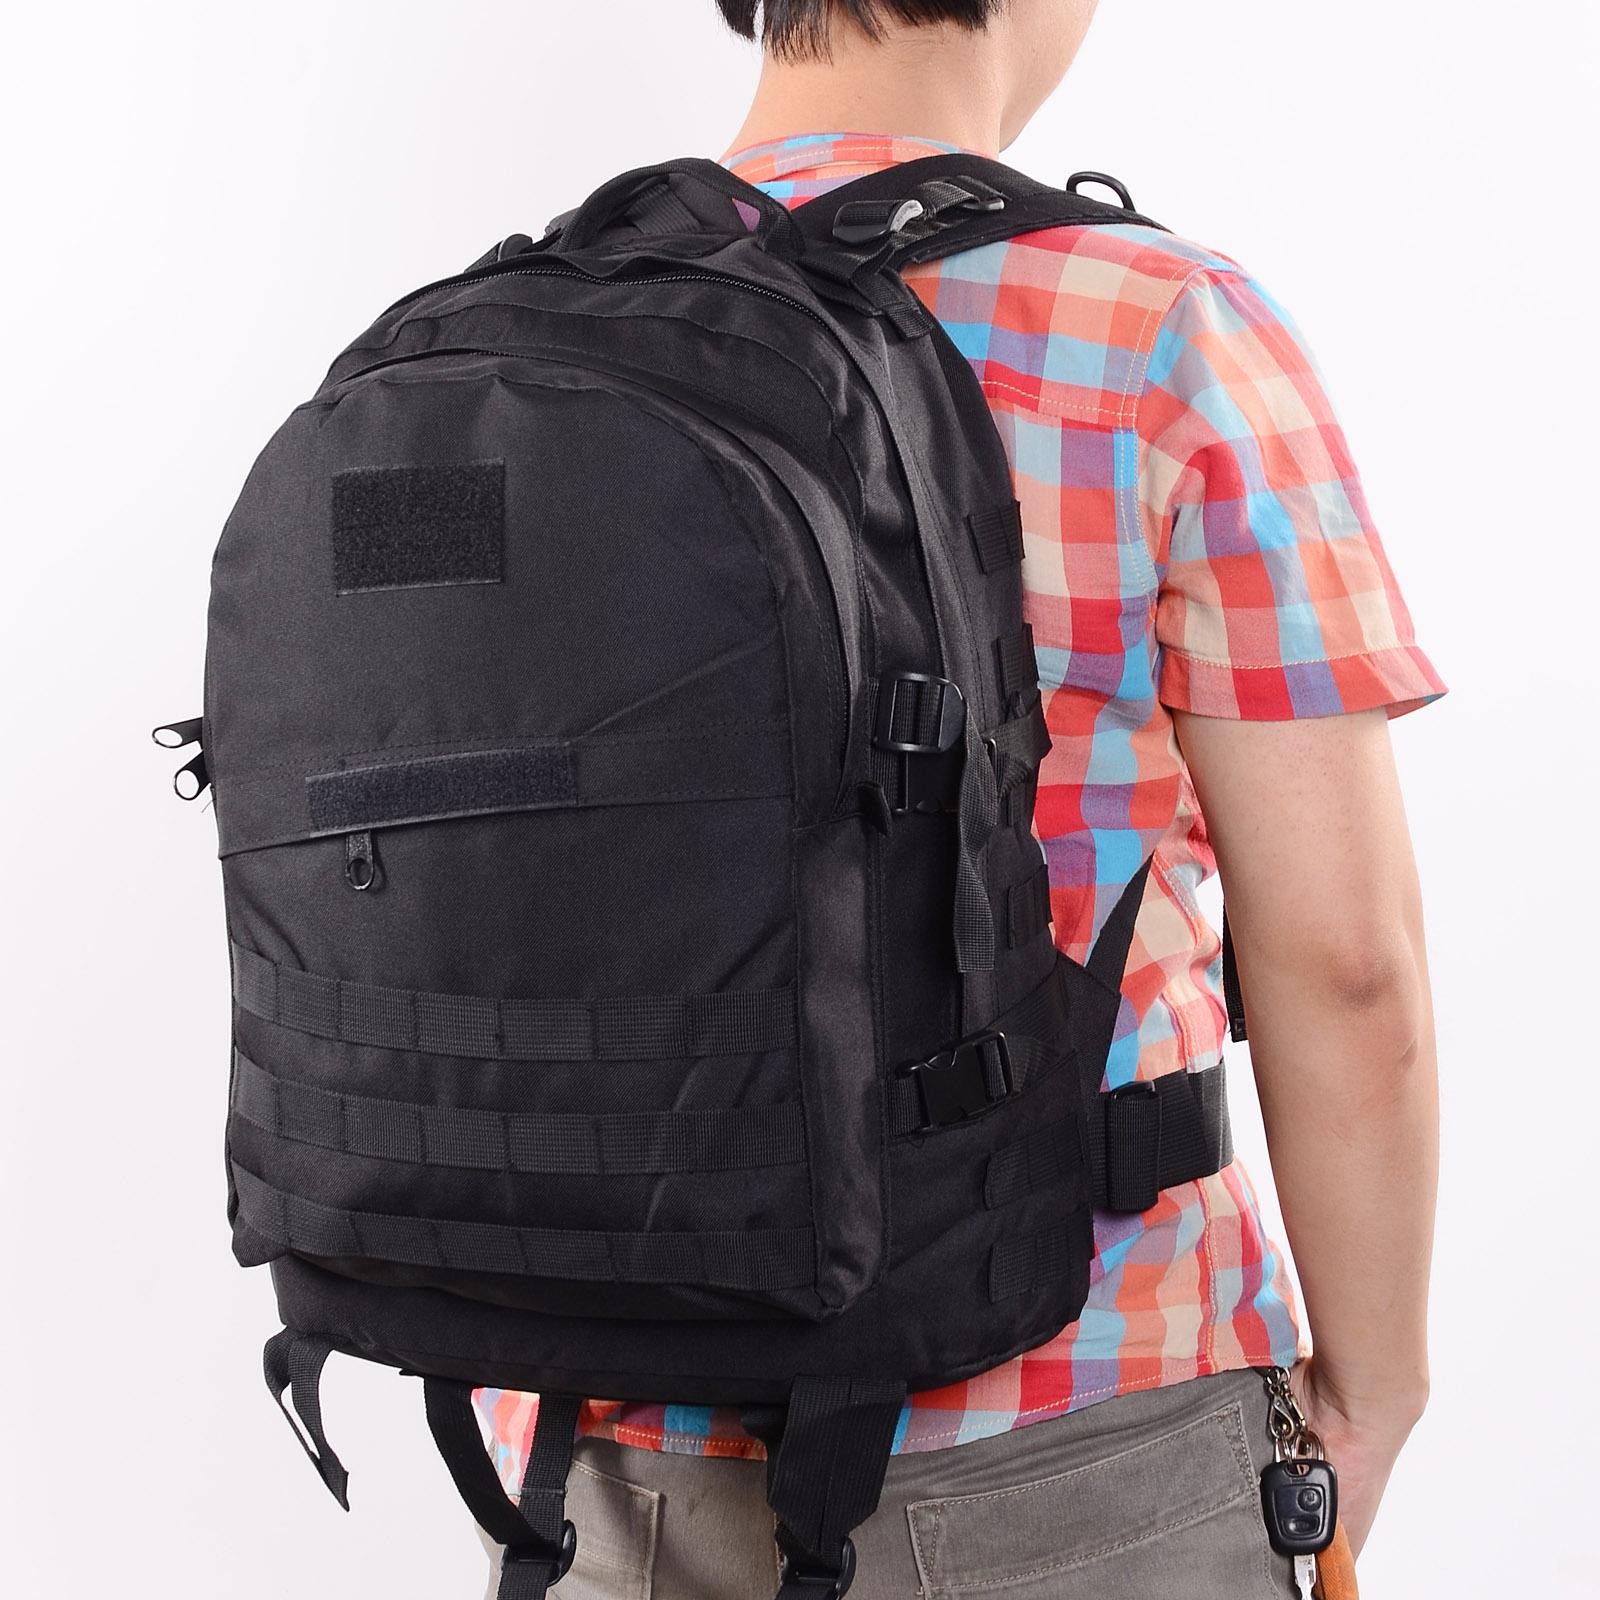 sac a dos tactique militaire outdoor camping backpack 40l etanche randonnee velo ebay. Black Bedroom Furniture Sets. Home Design Ideas